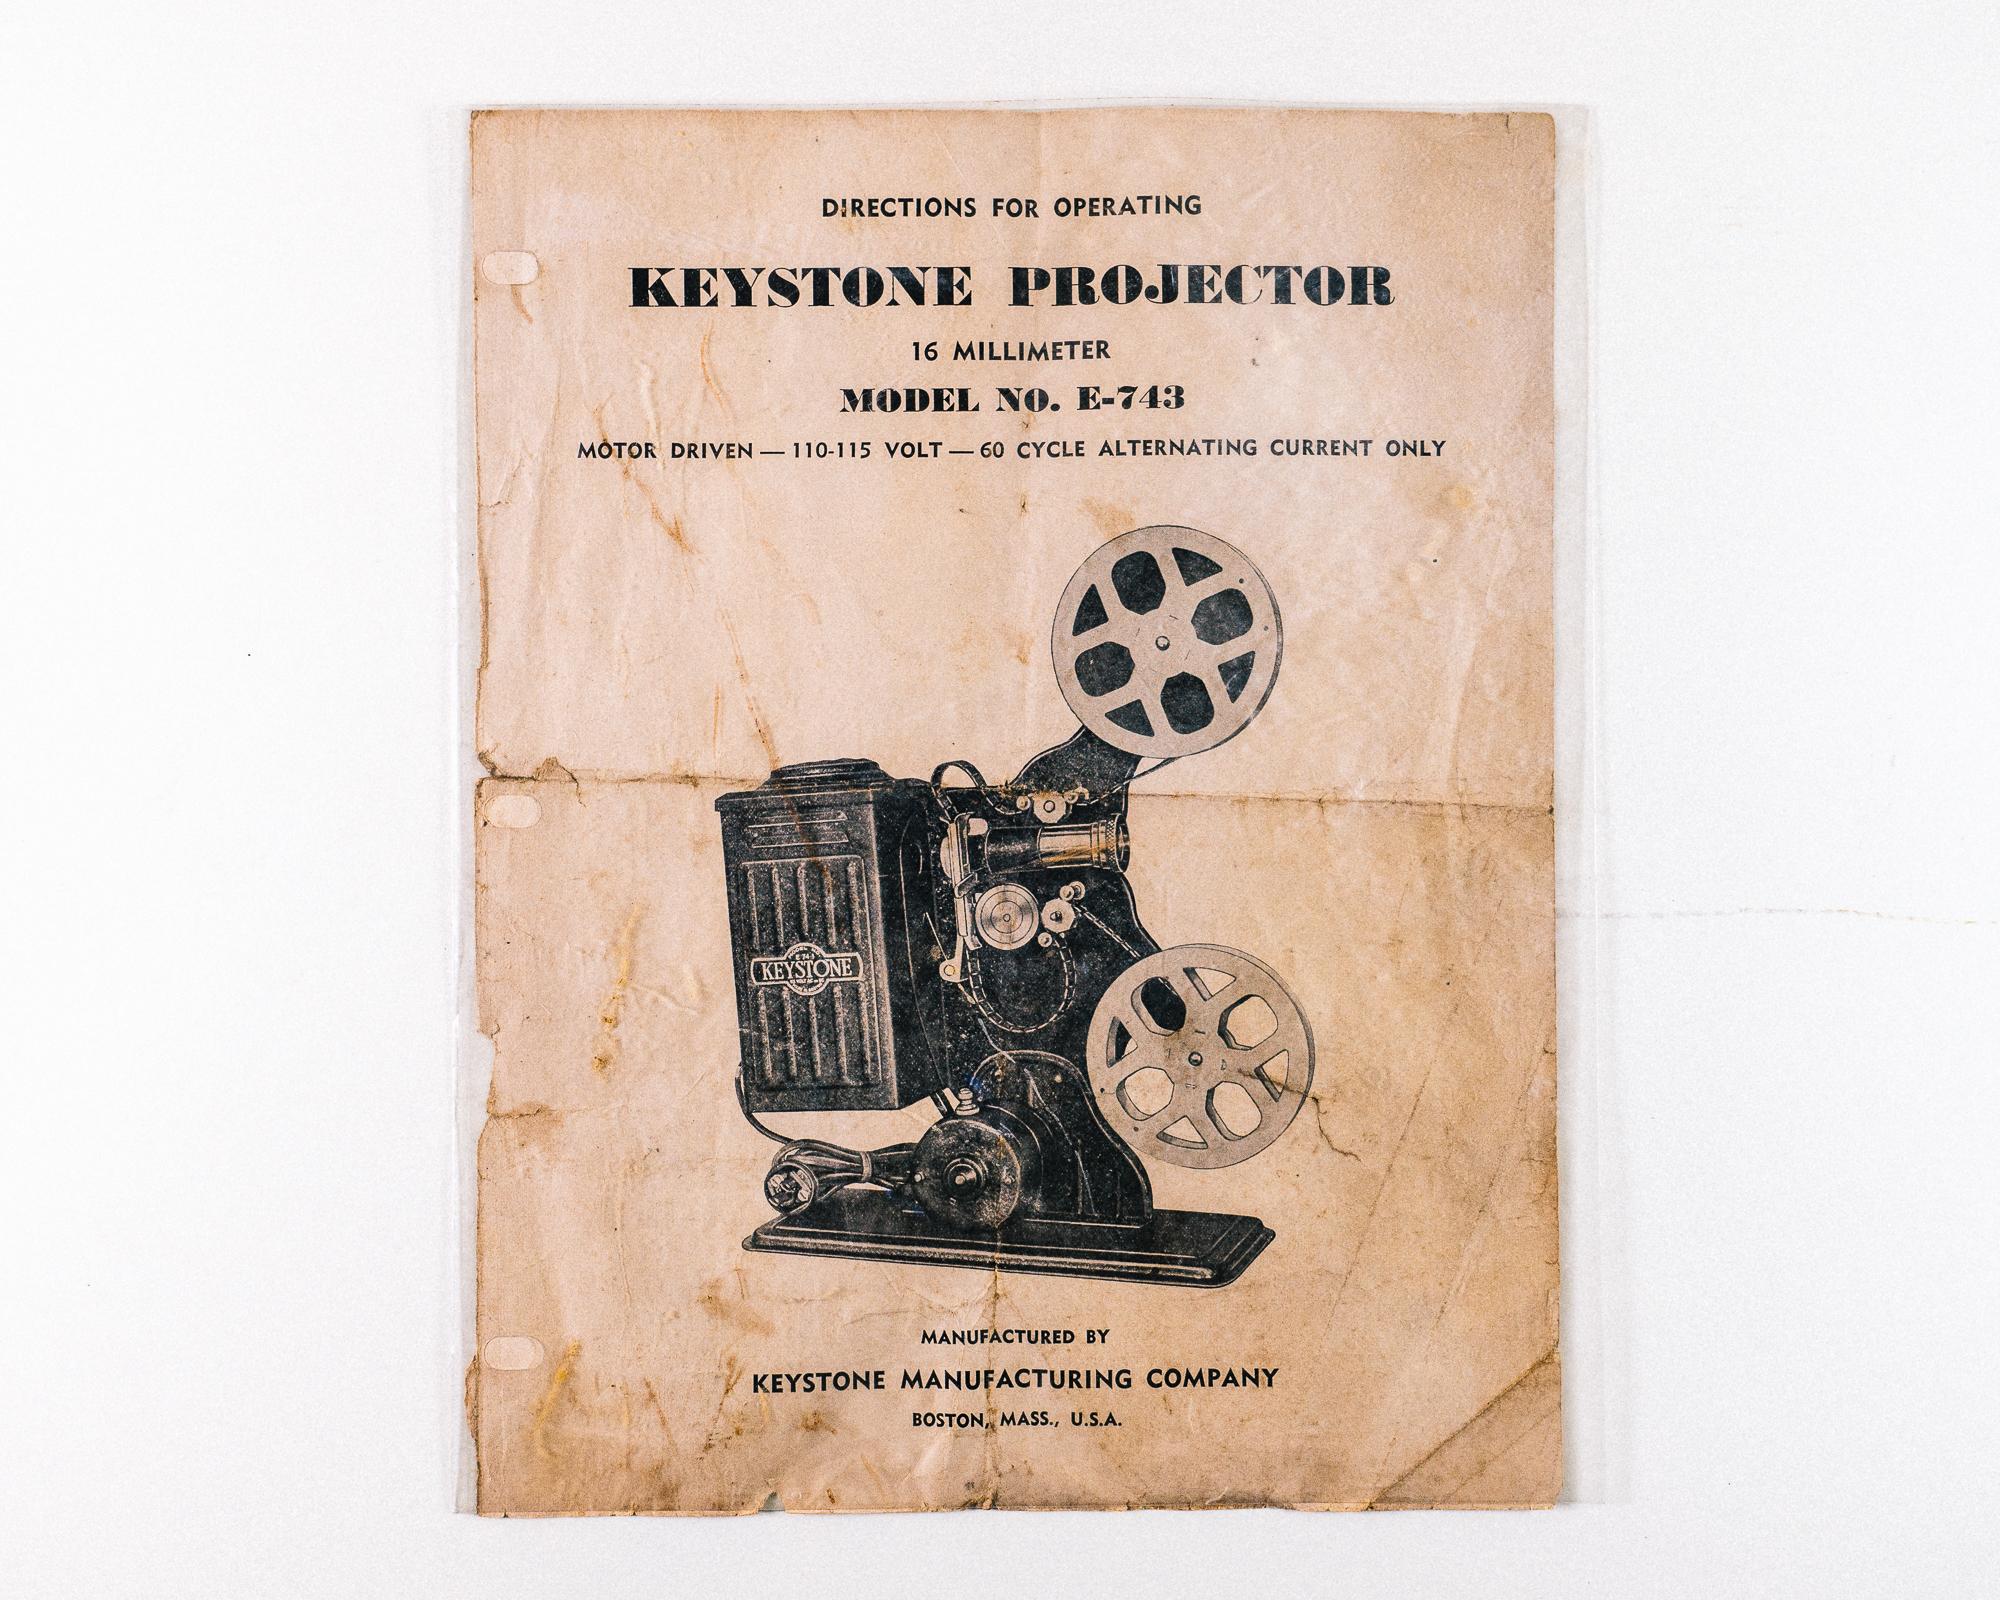 Keystone 16mm Film Movie Projector — Wilderness Trading Co